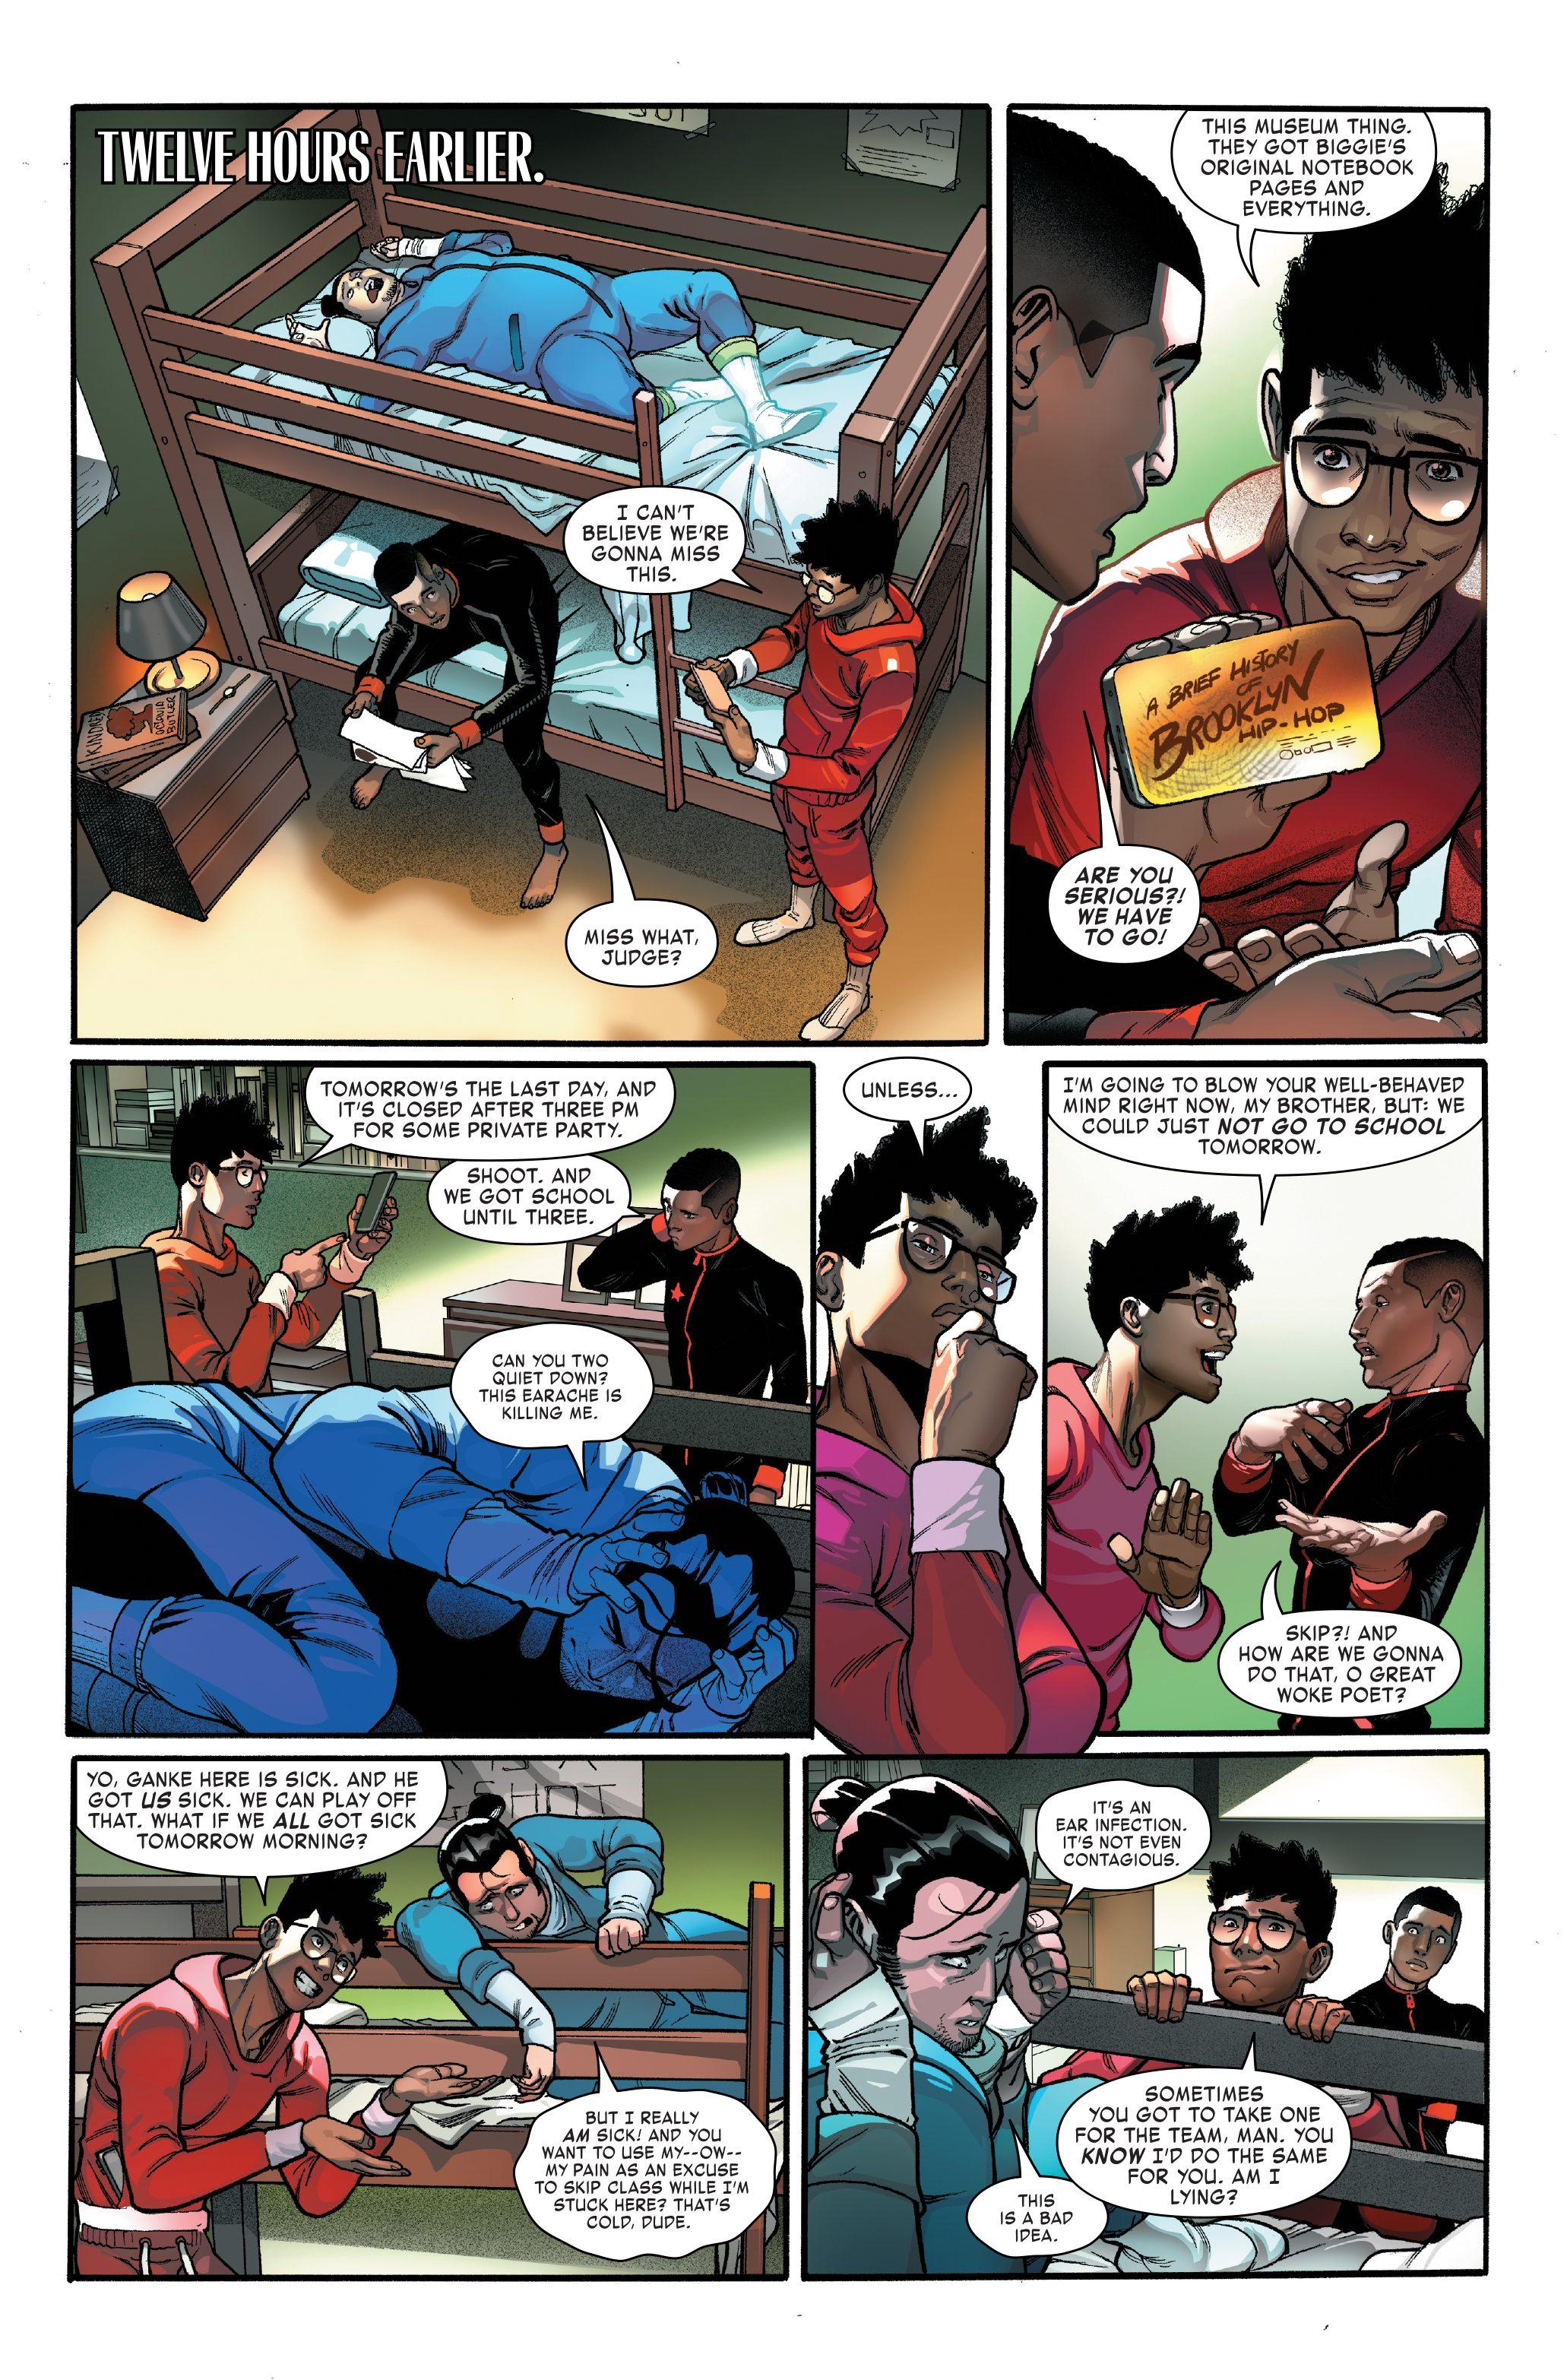 Miles Morales: Spider-Man #4 page 2